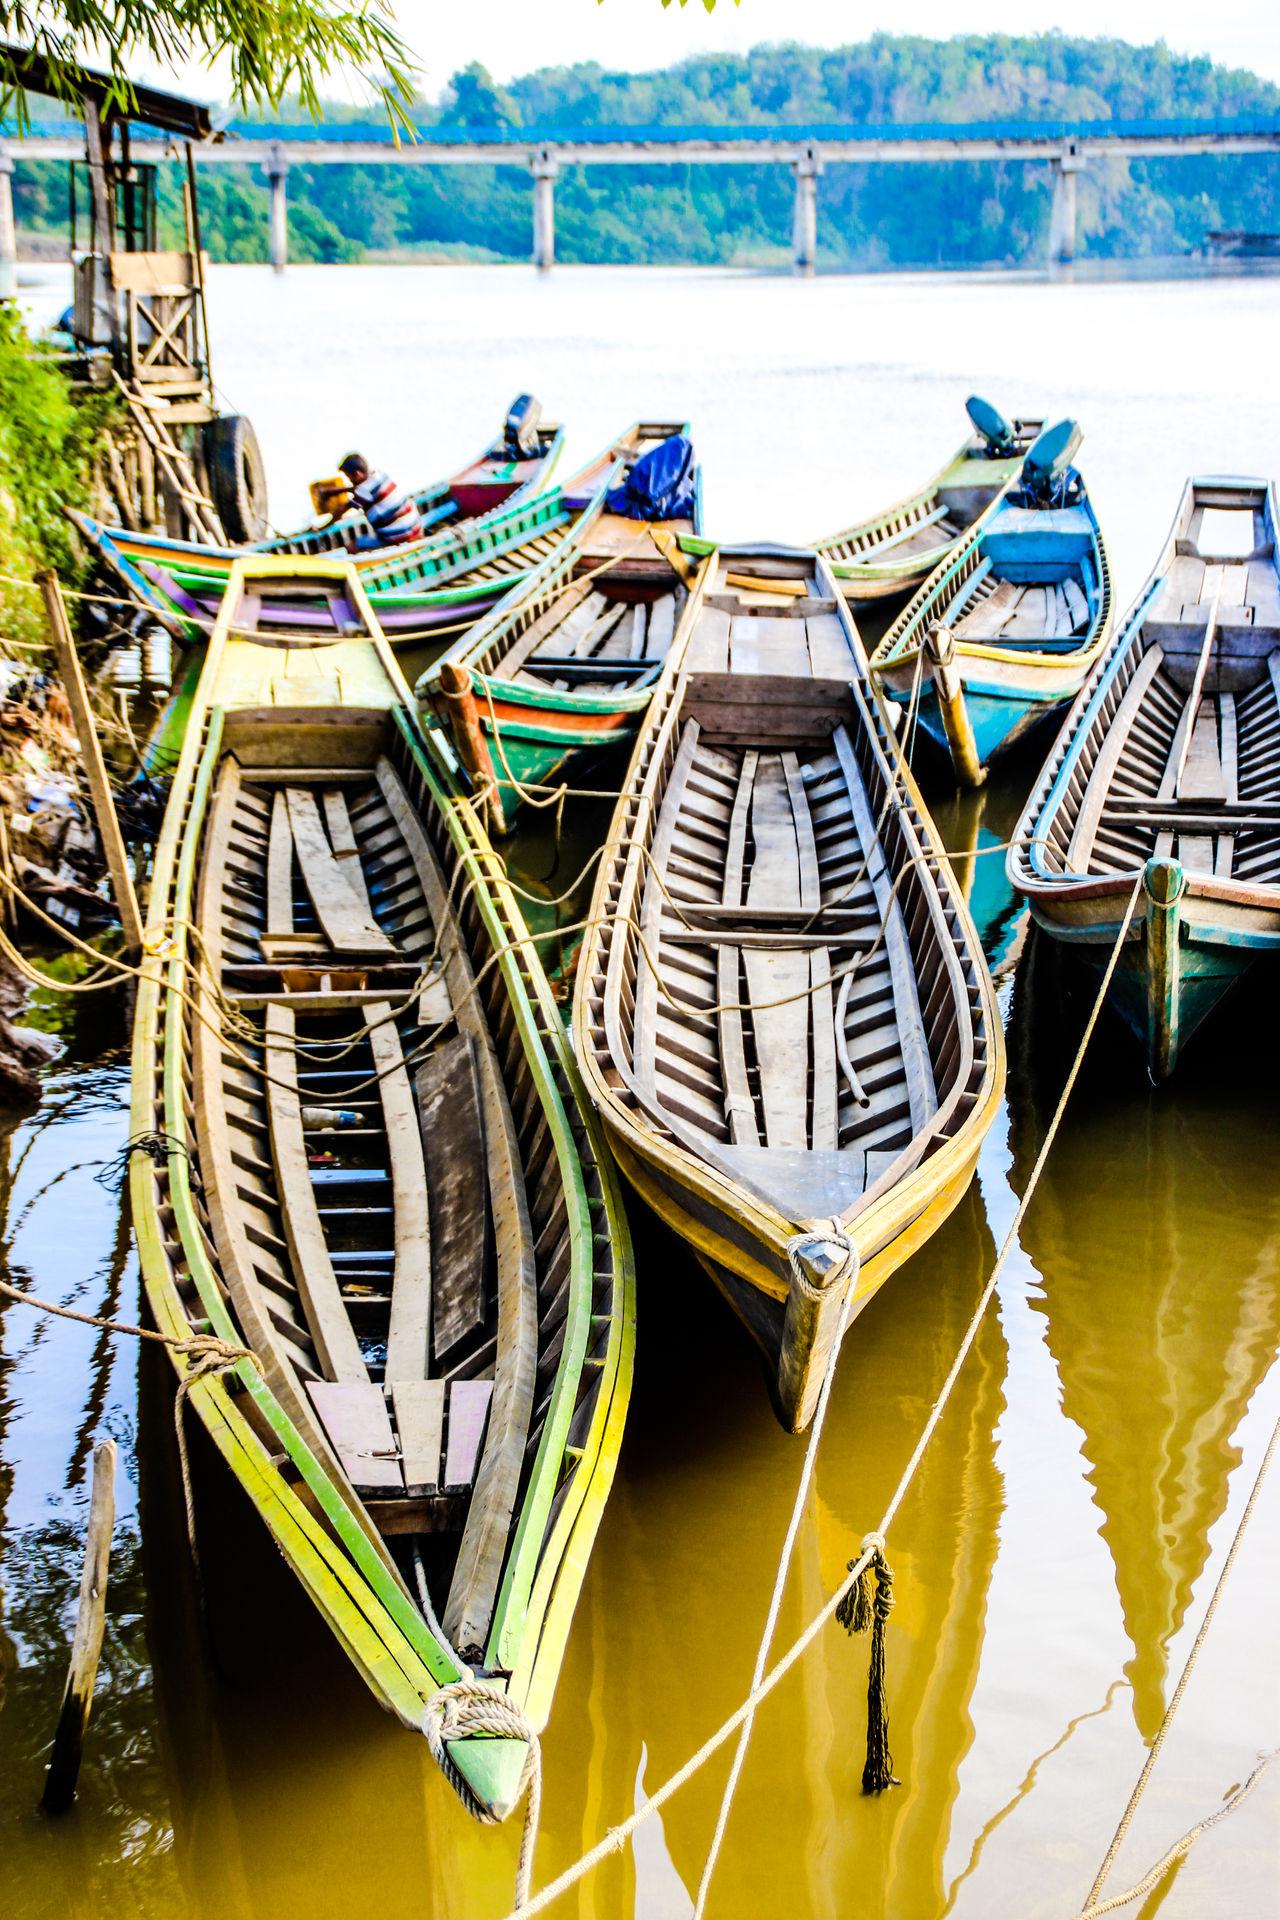 The Dock Of TEMPEK Boat Malephotographerofthemonth Global Photographer Works Exhibition Global Photographers Alliance Riverside Photography Sumateta Barat Minangkabau Rancak